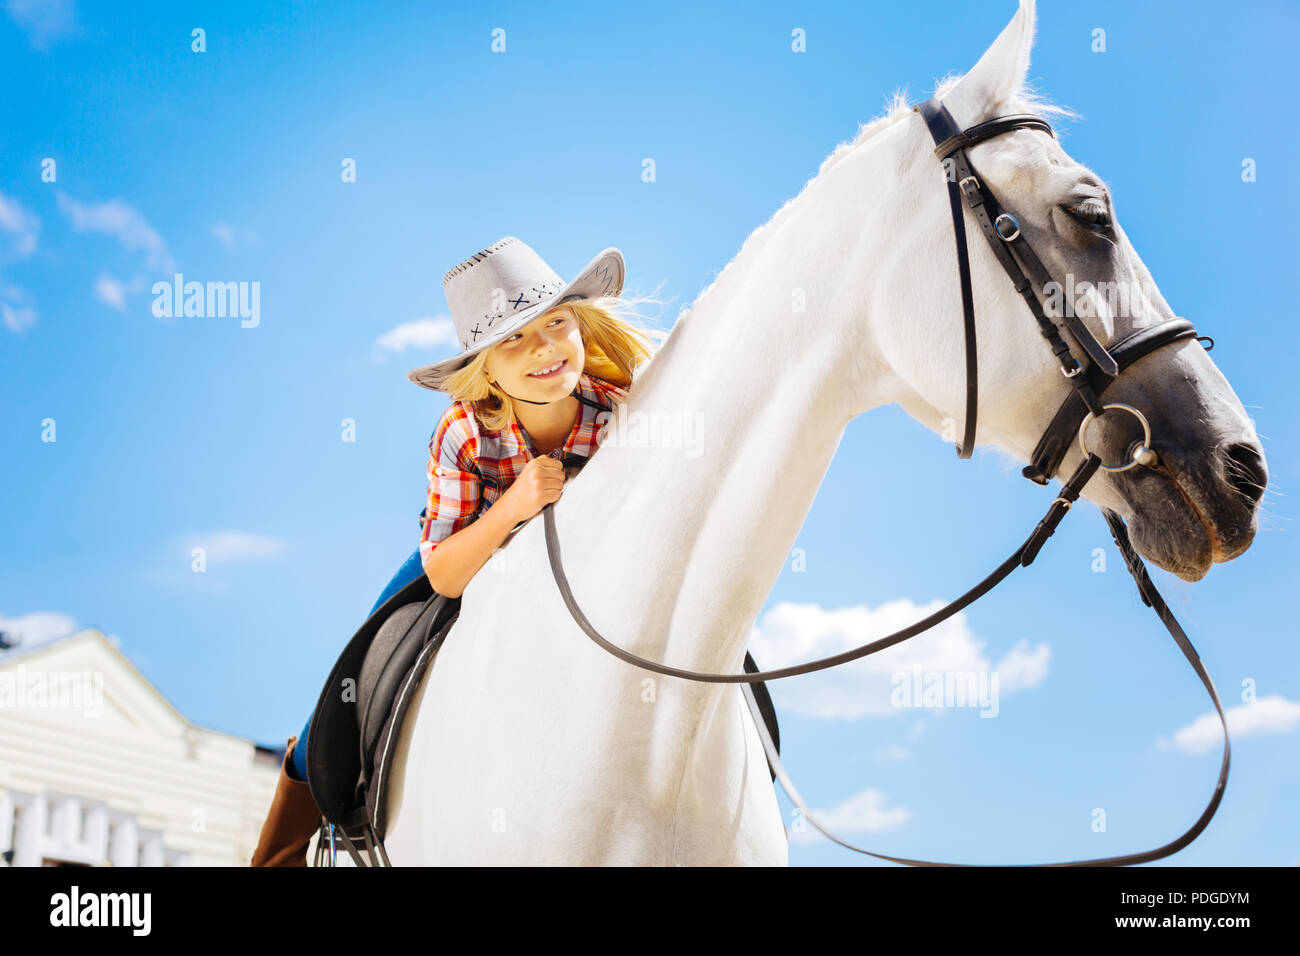 Blonde-haired cute girl feeling amazing white riding horse - Stock Image